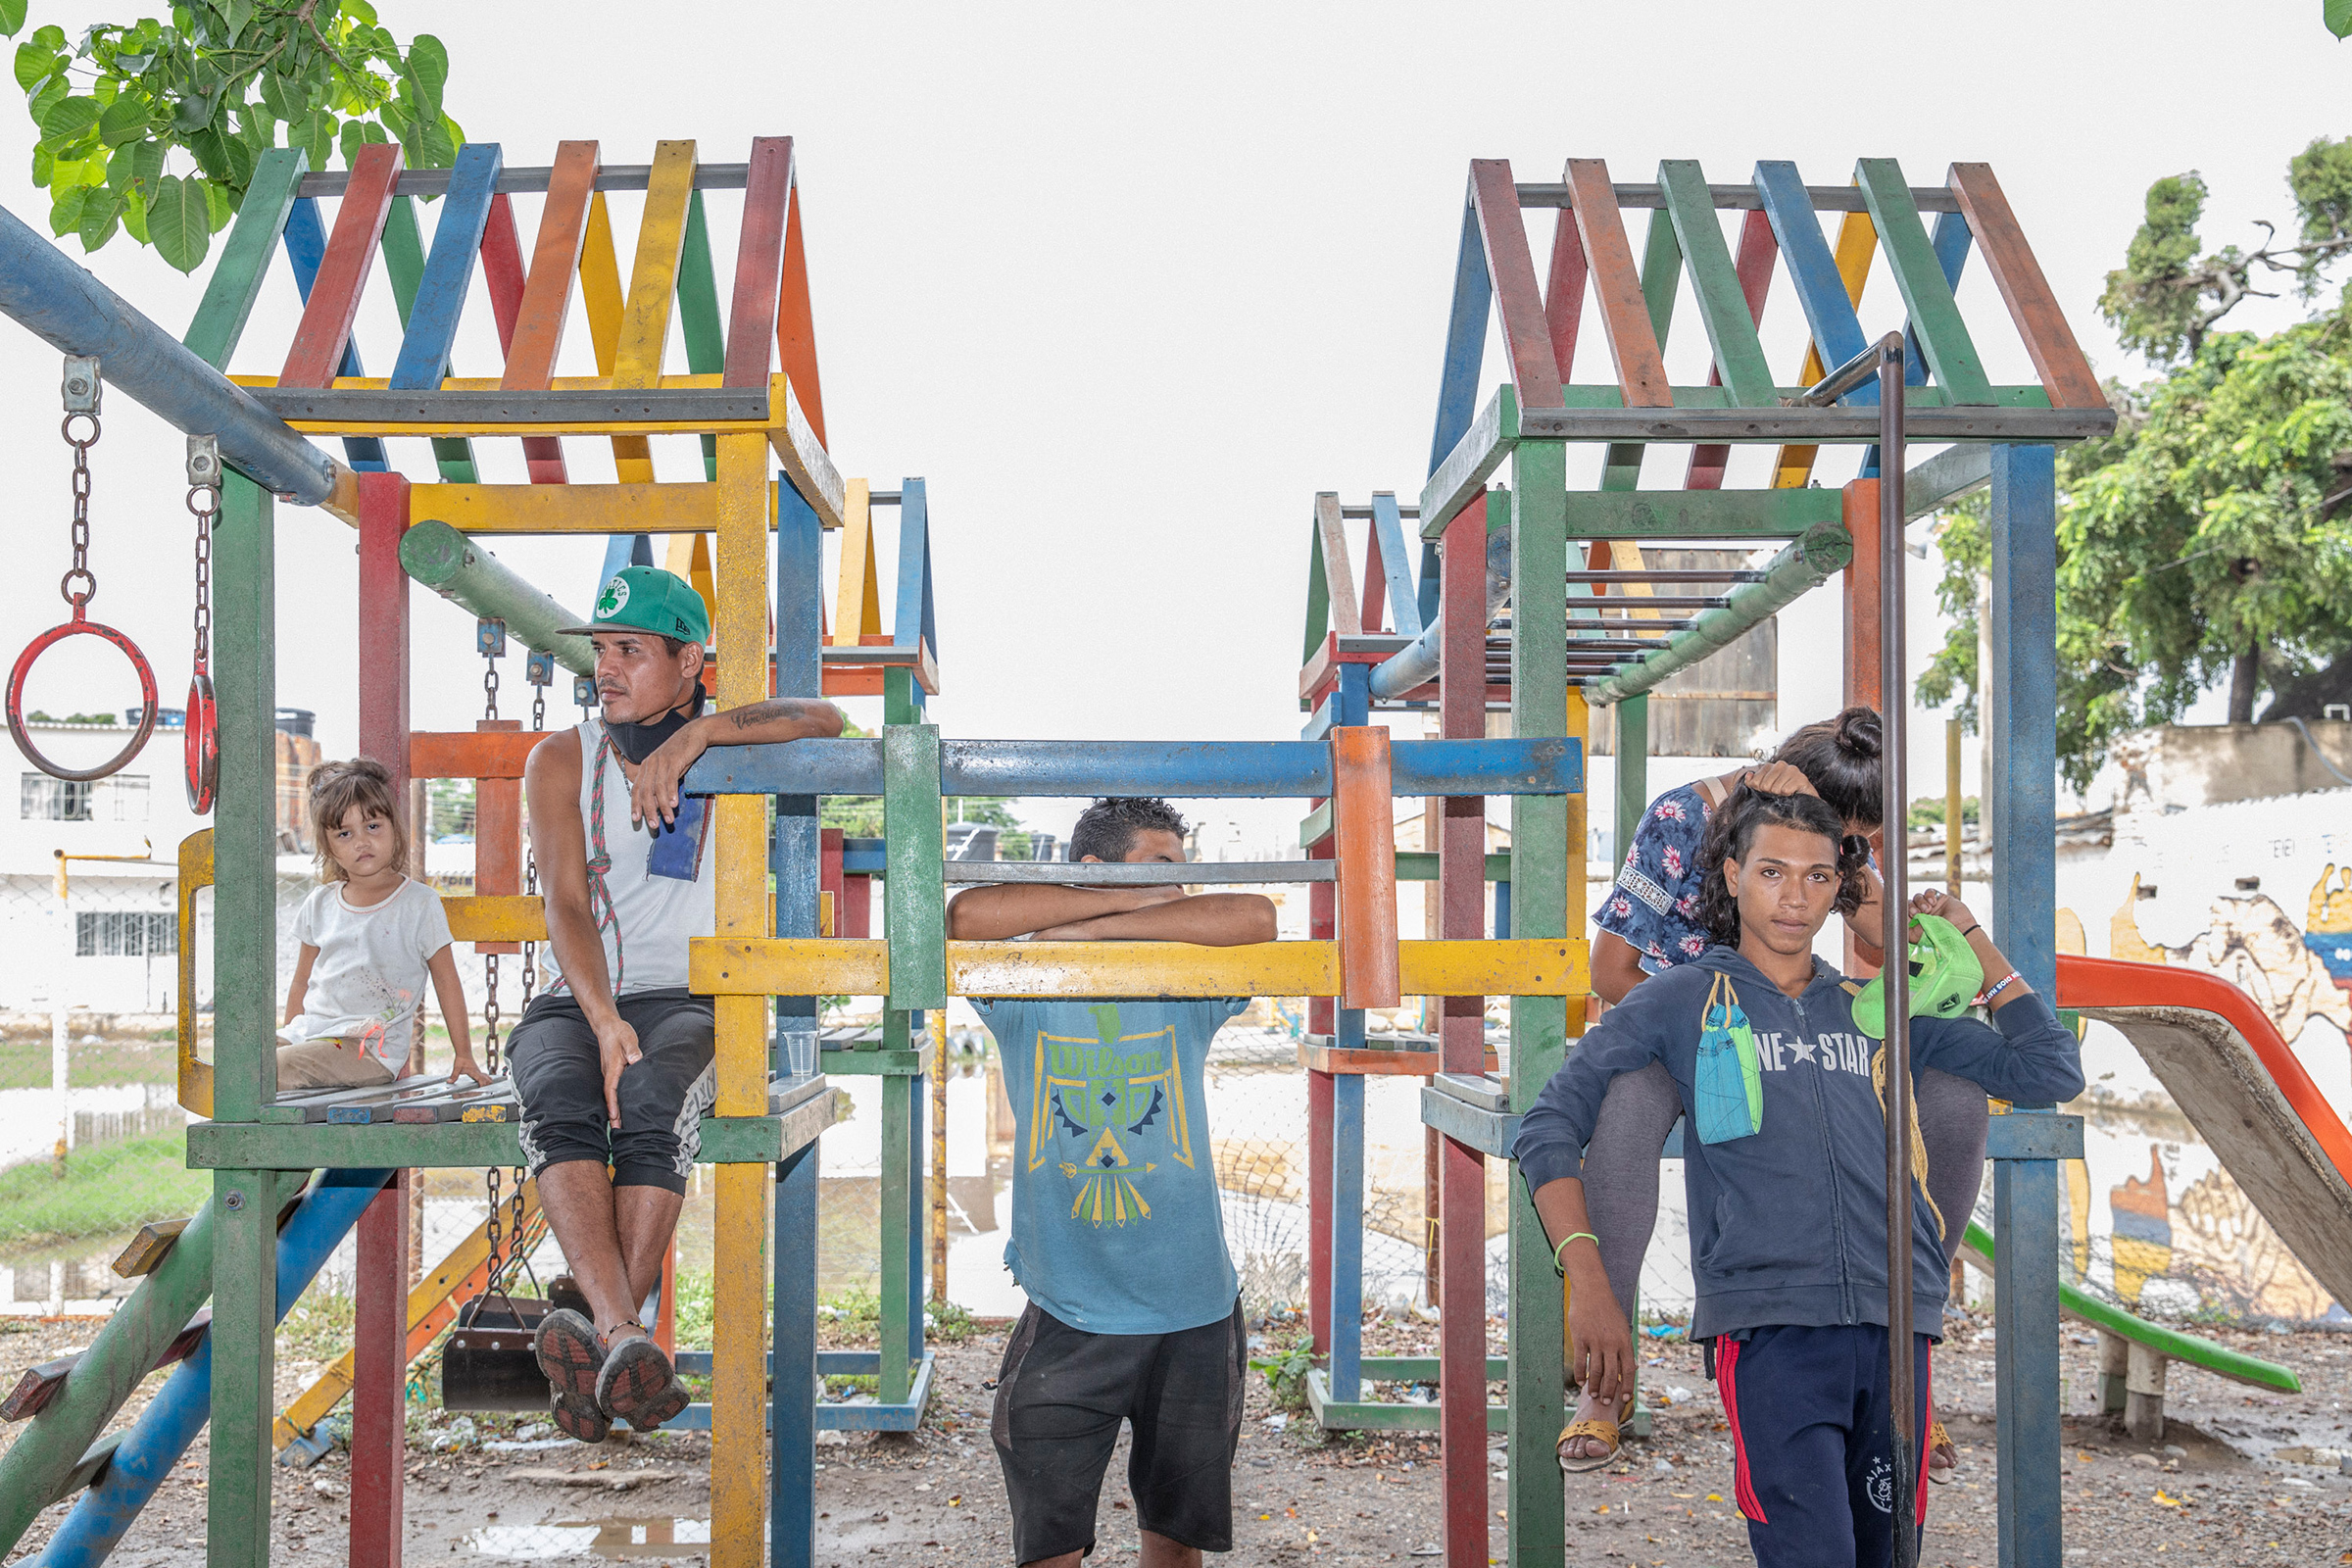 Un grupo de venezolanos en un parque infantil en un parque fronterizo.